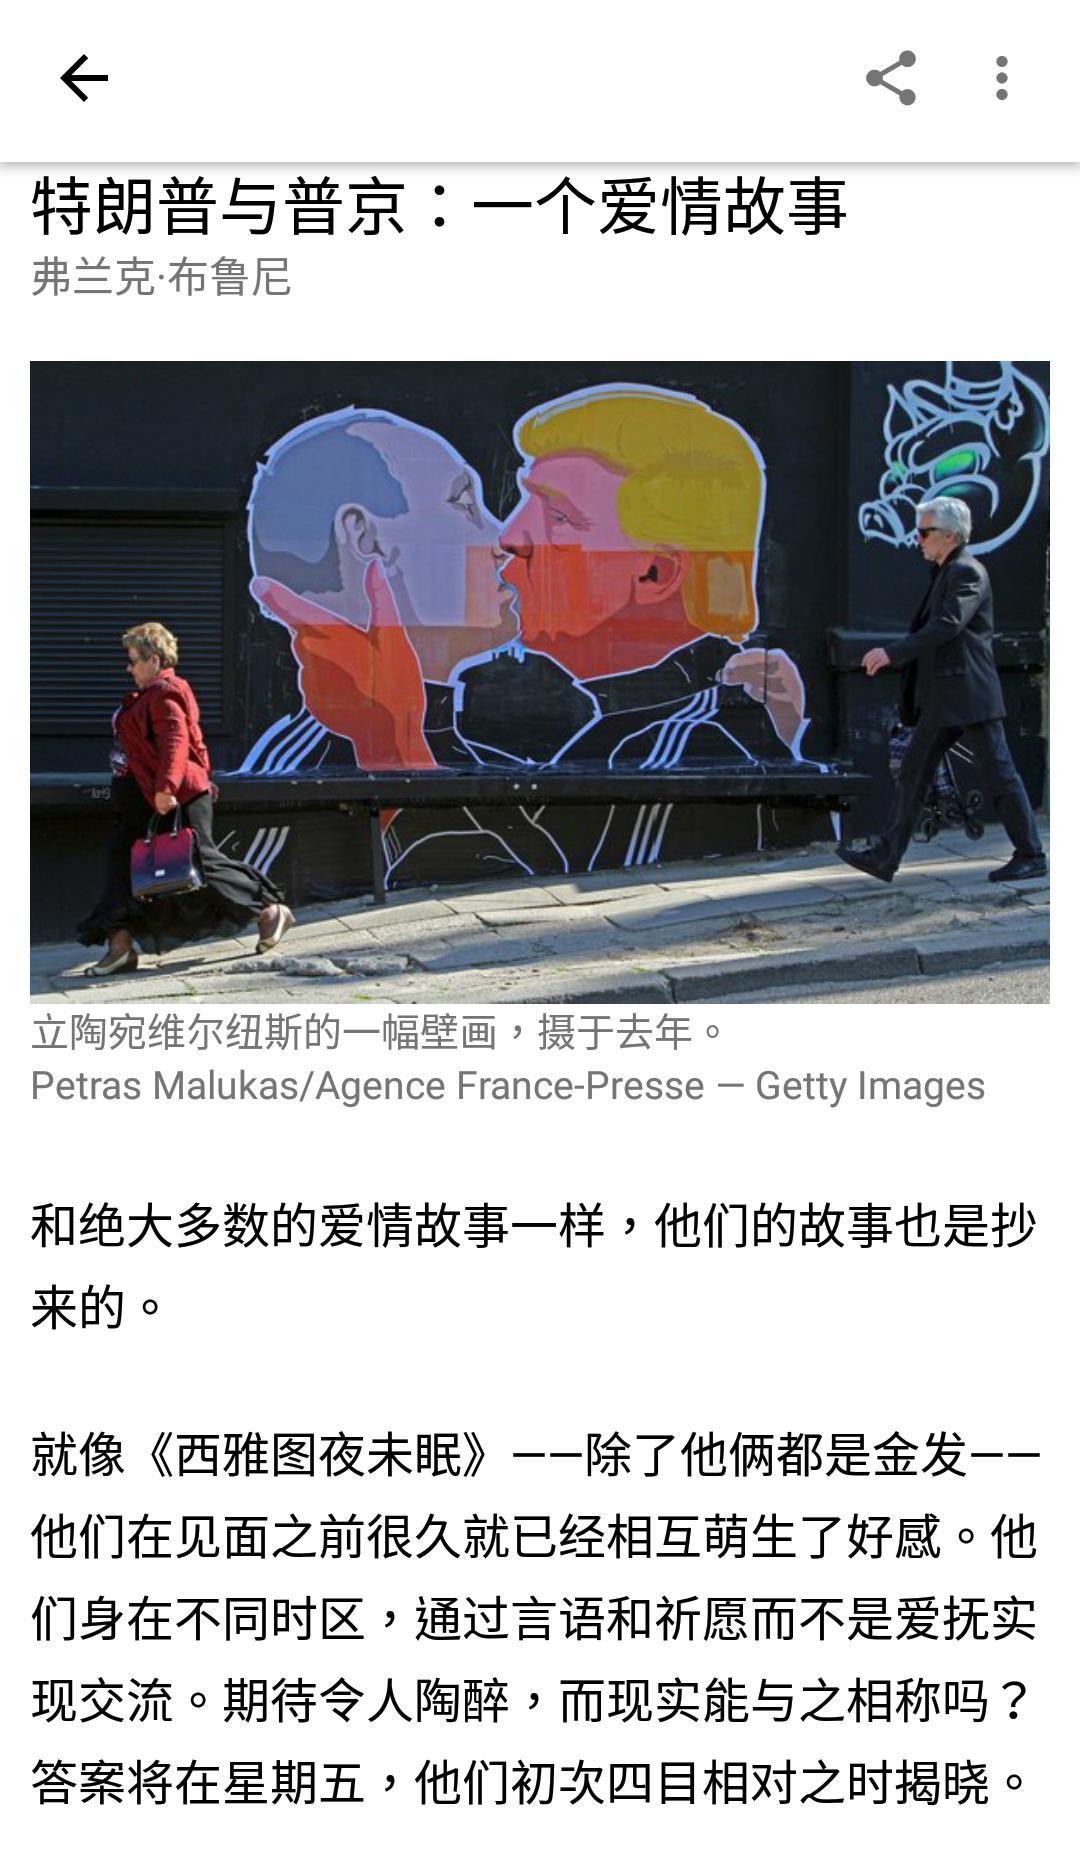 NYTimes - Chinese Edition 1.1.0.29 Screenshot 4